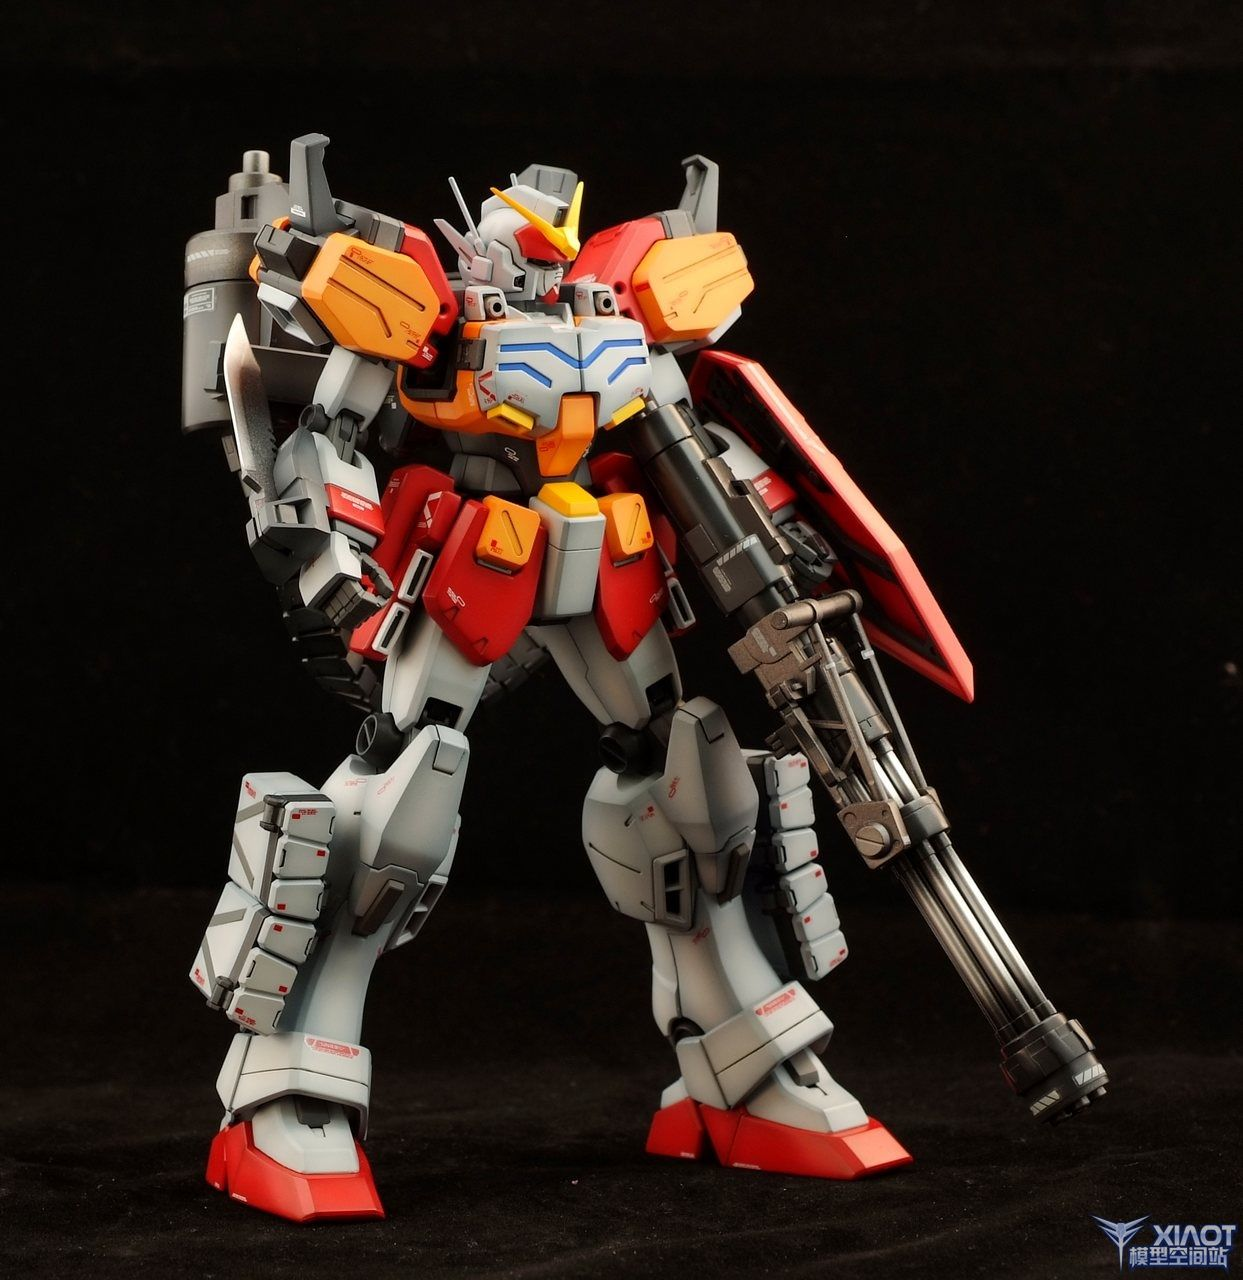 MG Gundam HeavyArms Custom: Painted Build. | Hobby & Toy ...